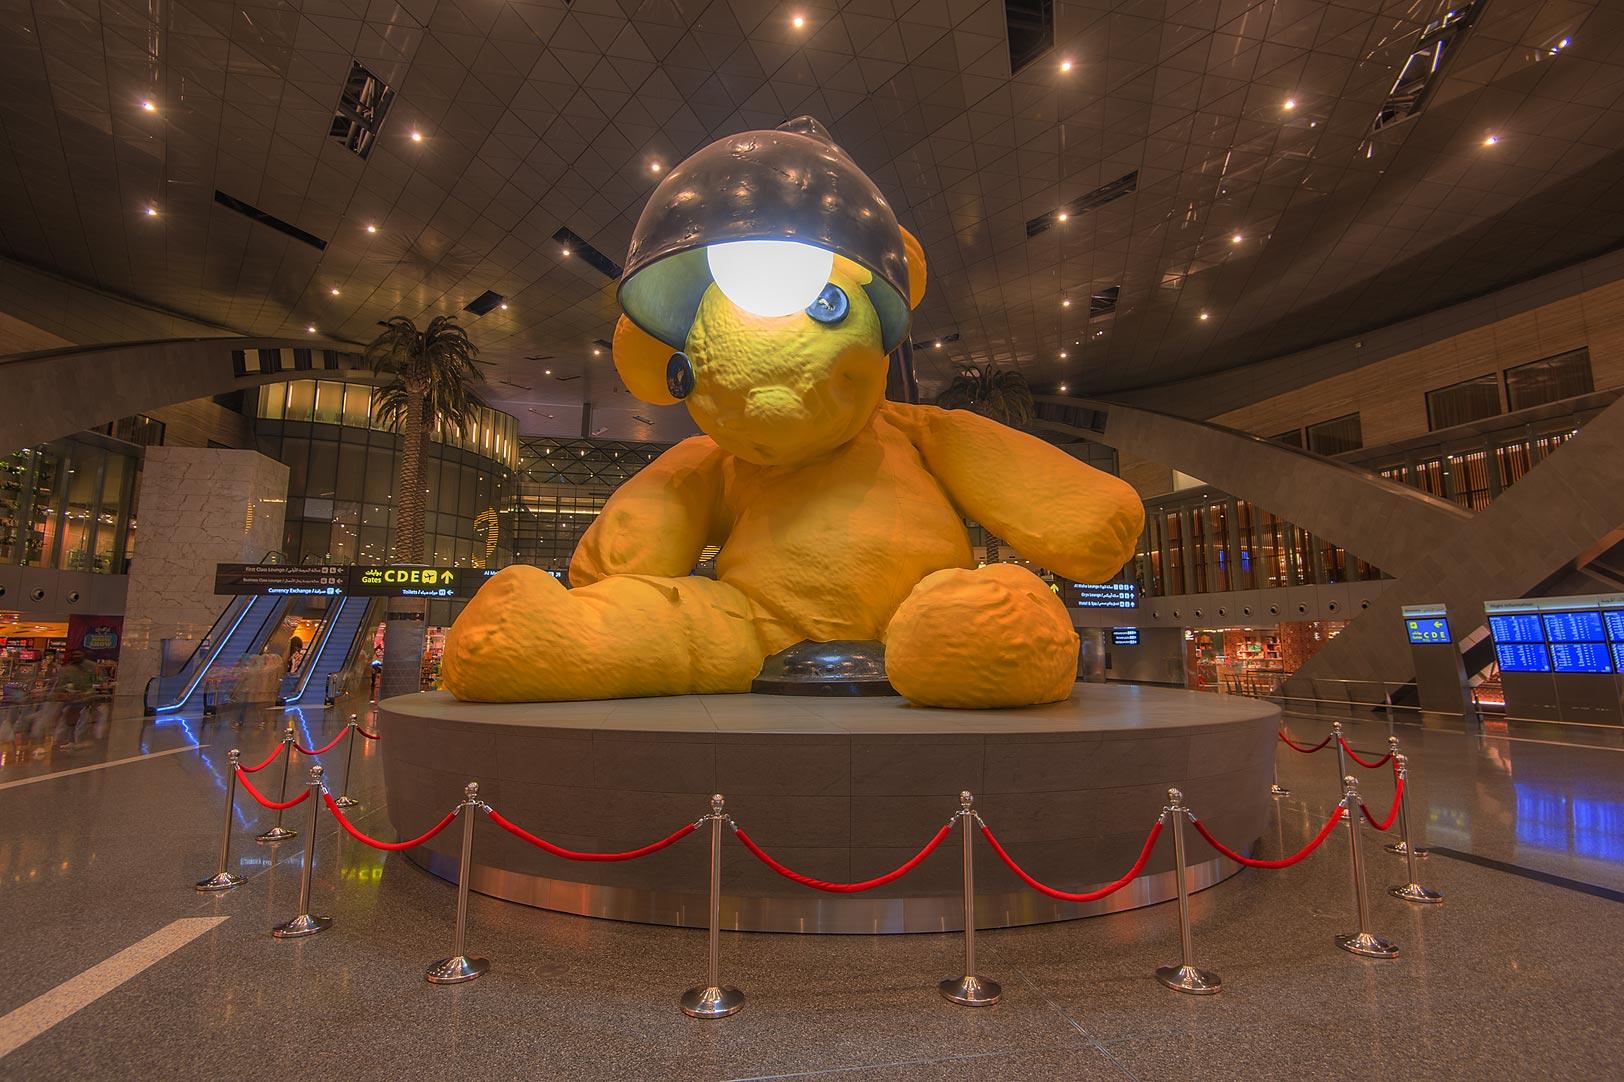 photo 159403 lamp bear sculpture by urs fischer in hamad